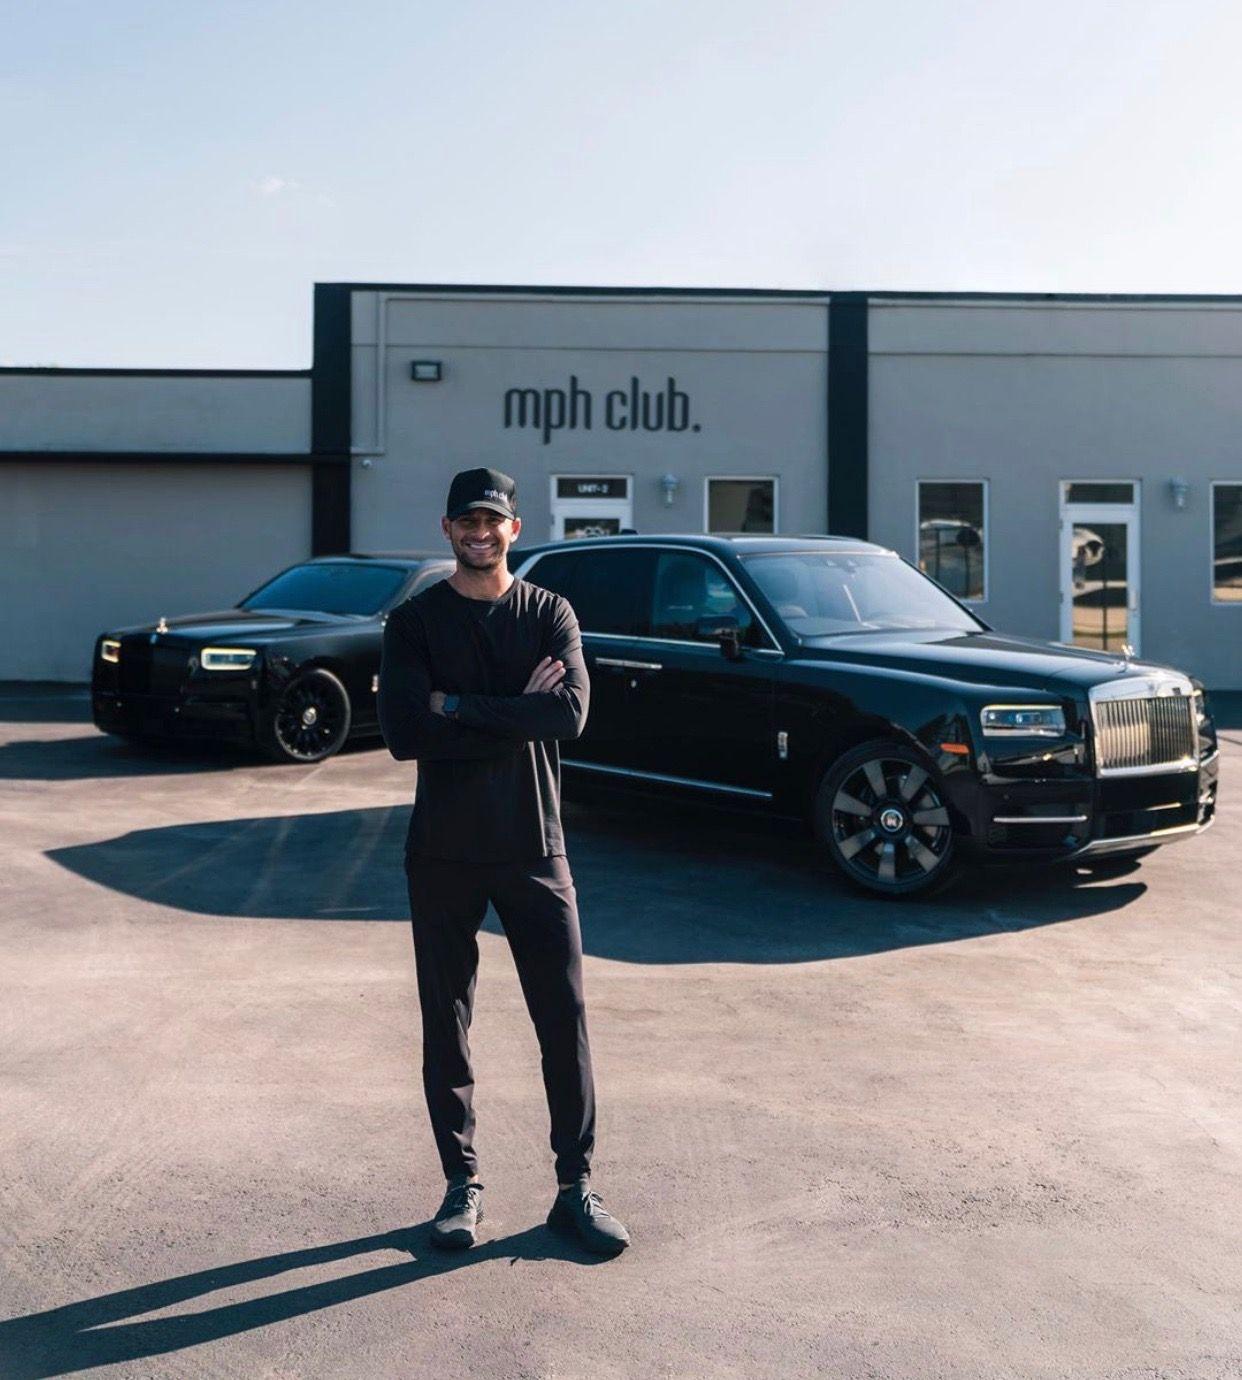 Custom Luxury Vehicle Fanatic Liram Sustiel Donates His Lamborghini Income To Charity Nashville News Dan Bilzerian Entertainment Industry